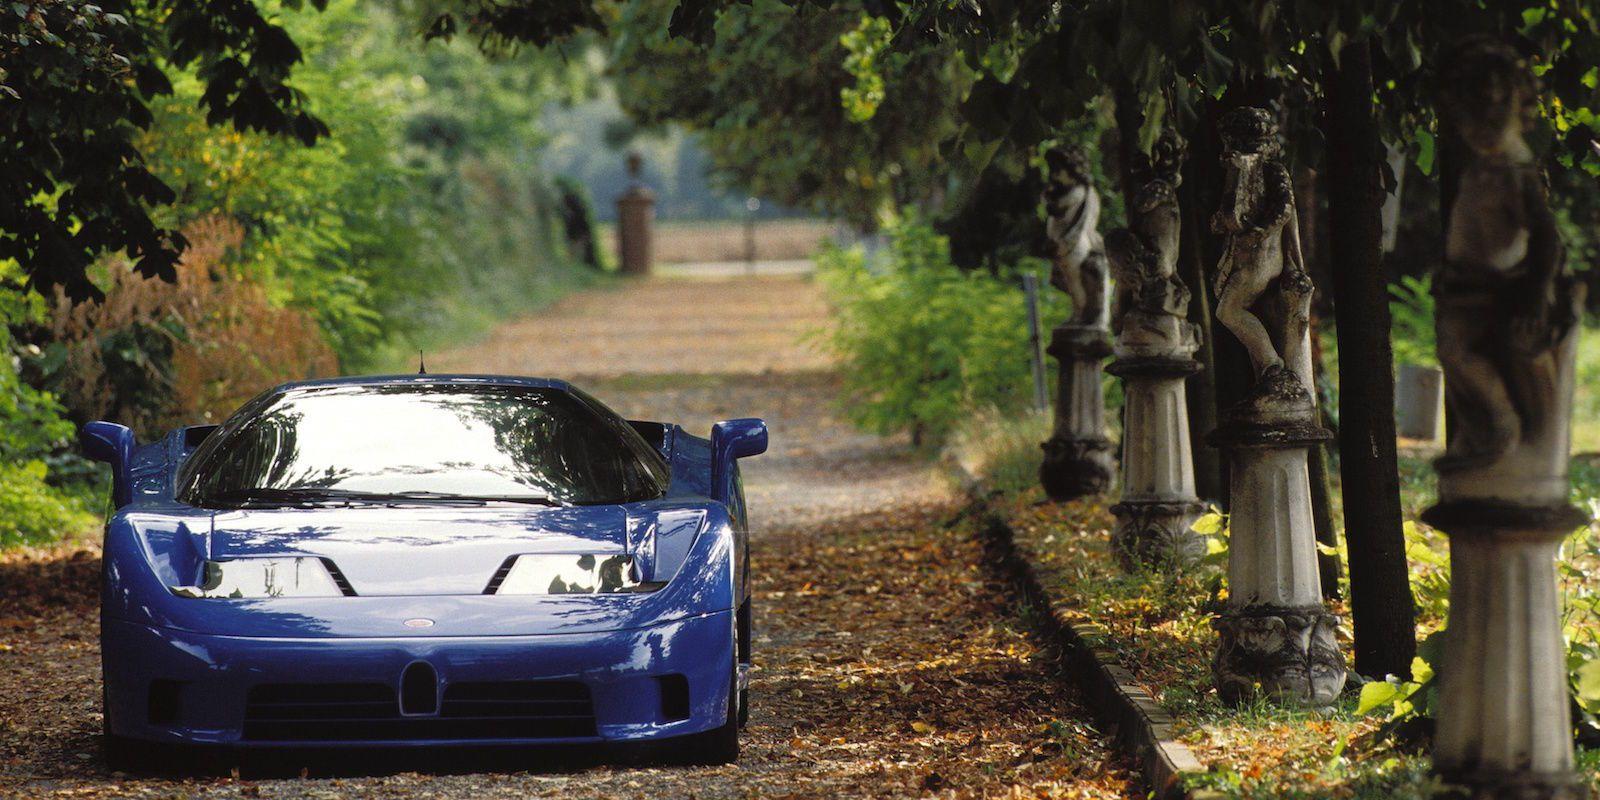 The Man Who Created the Bugatti EB110 Says Industry Sabotage Shut ...